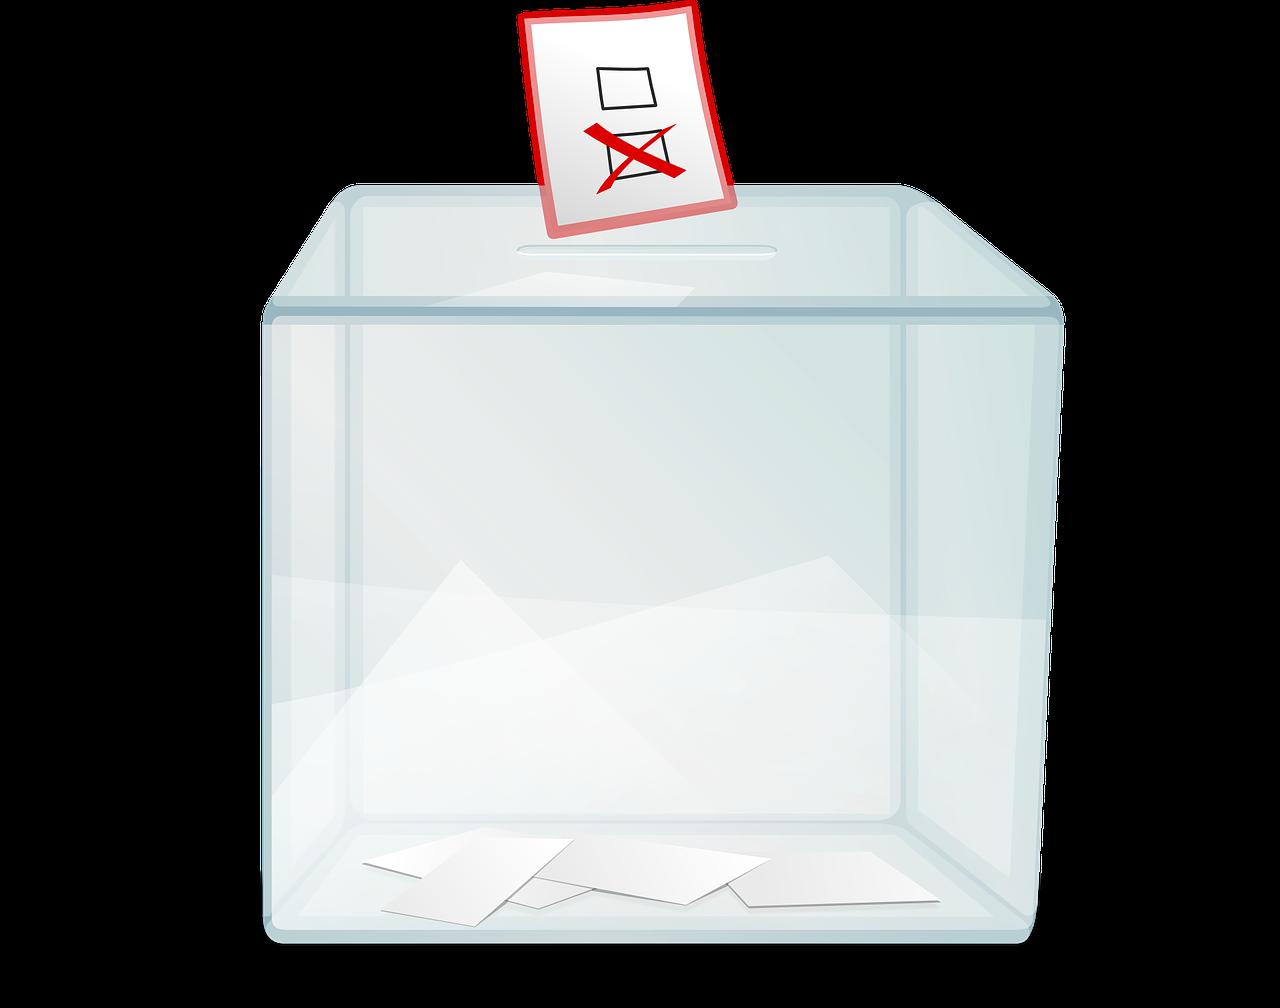 http://m.82-200.pl/2018/02/orig/ballot-box-32384-1280-2503.png